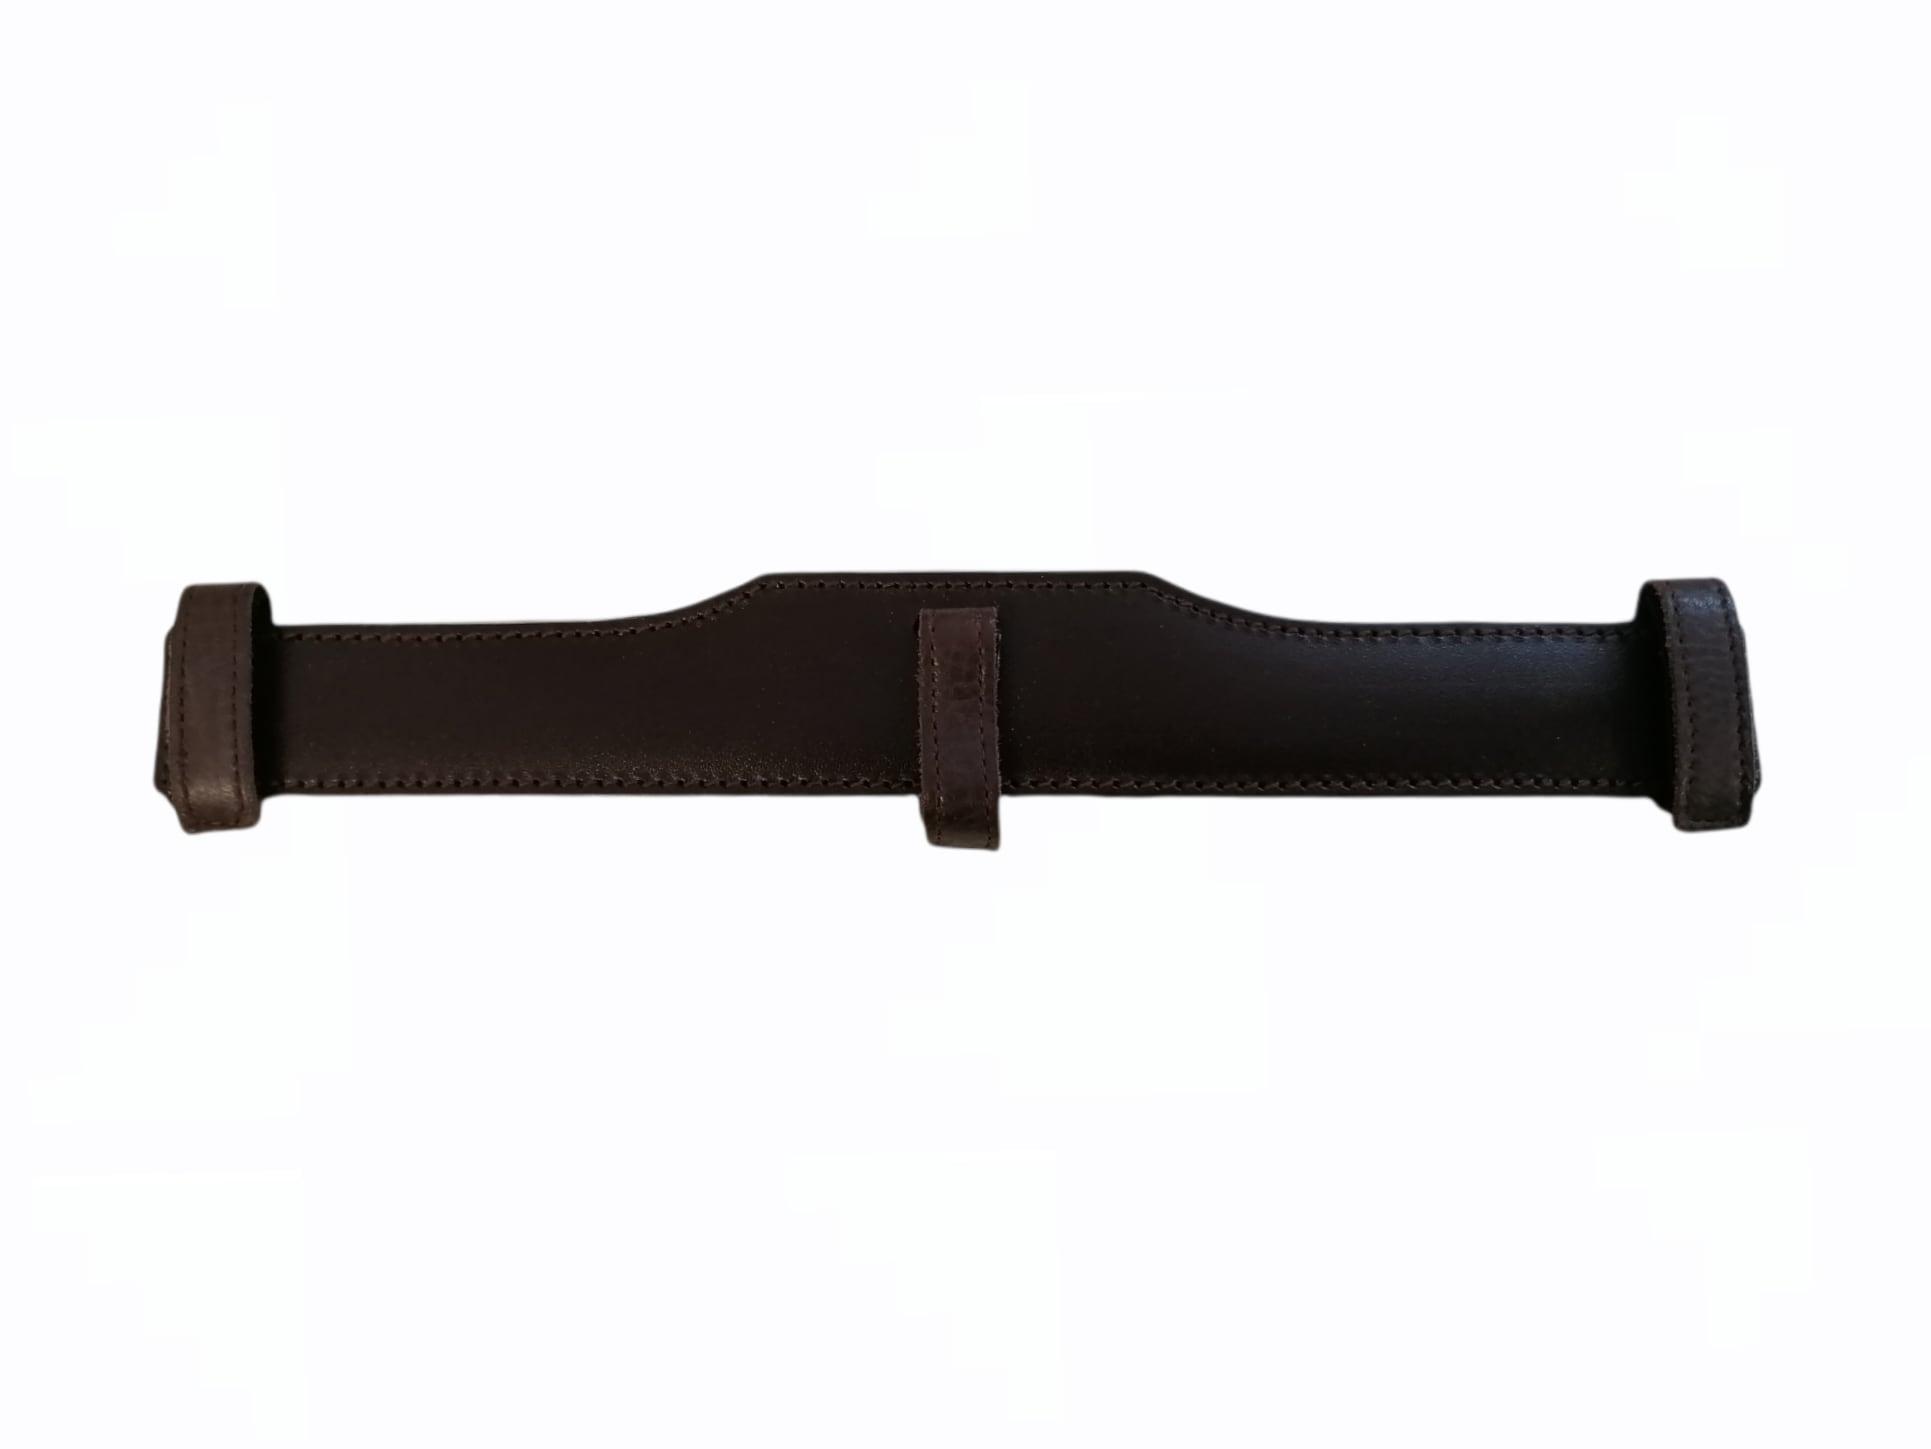 Nackenpolster Döbert - braun